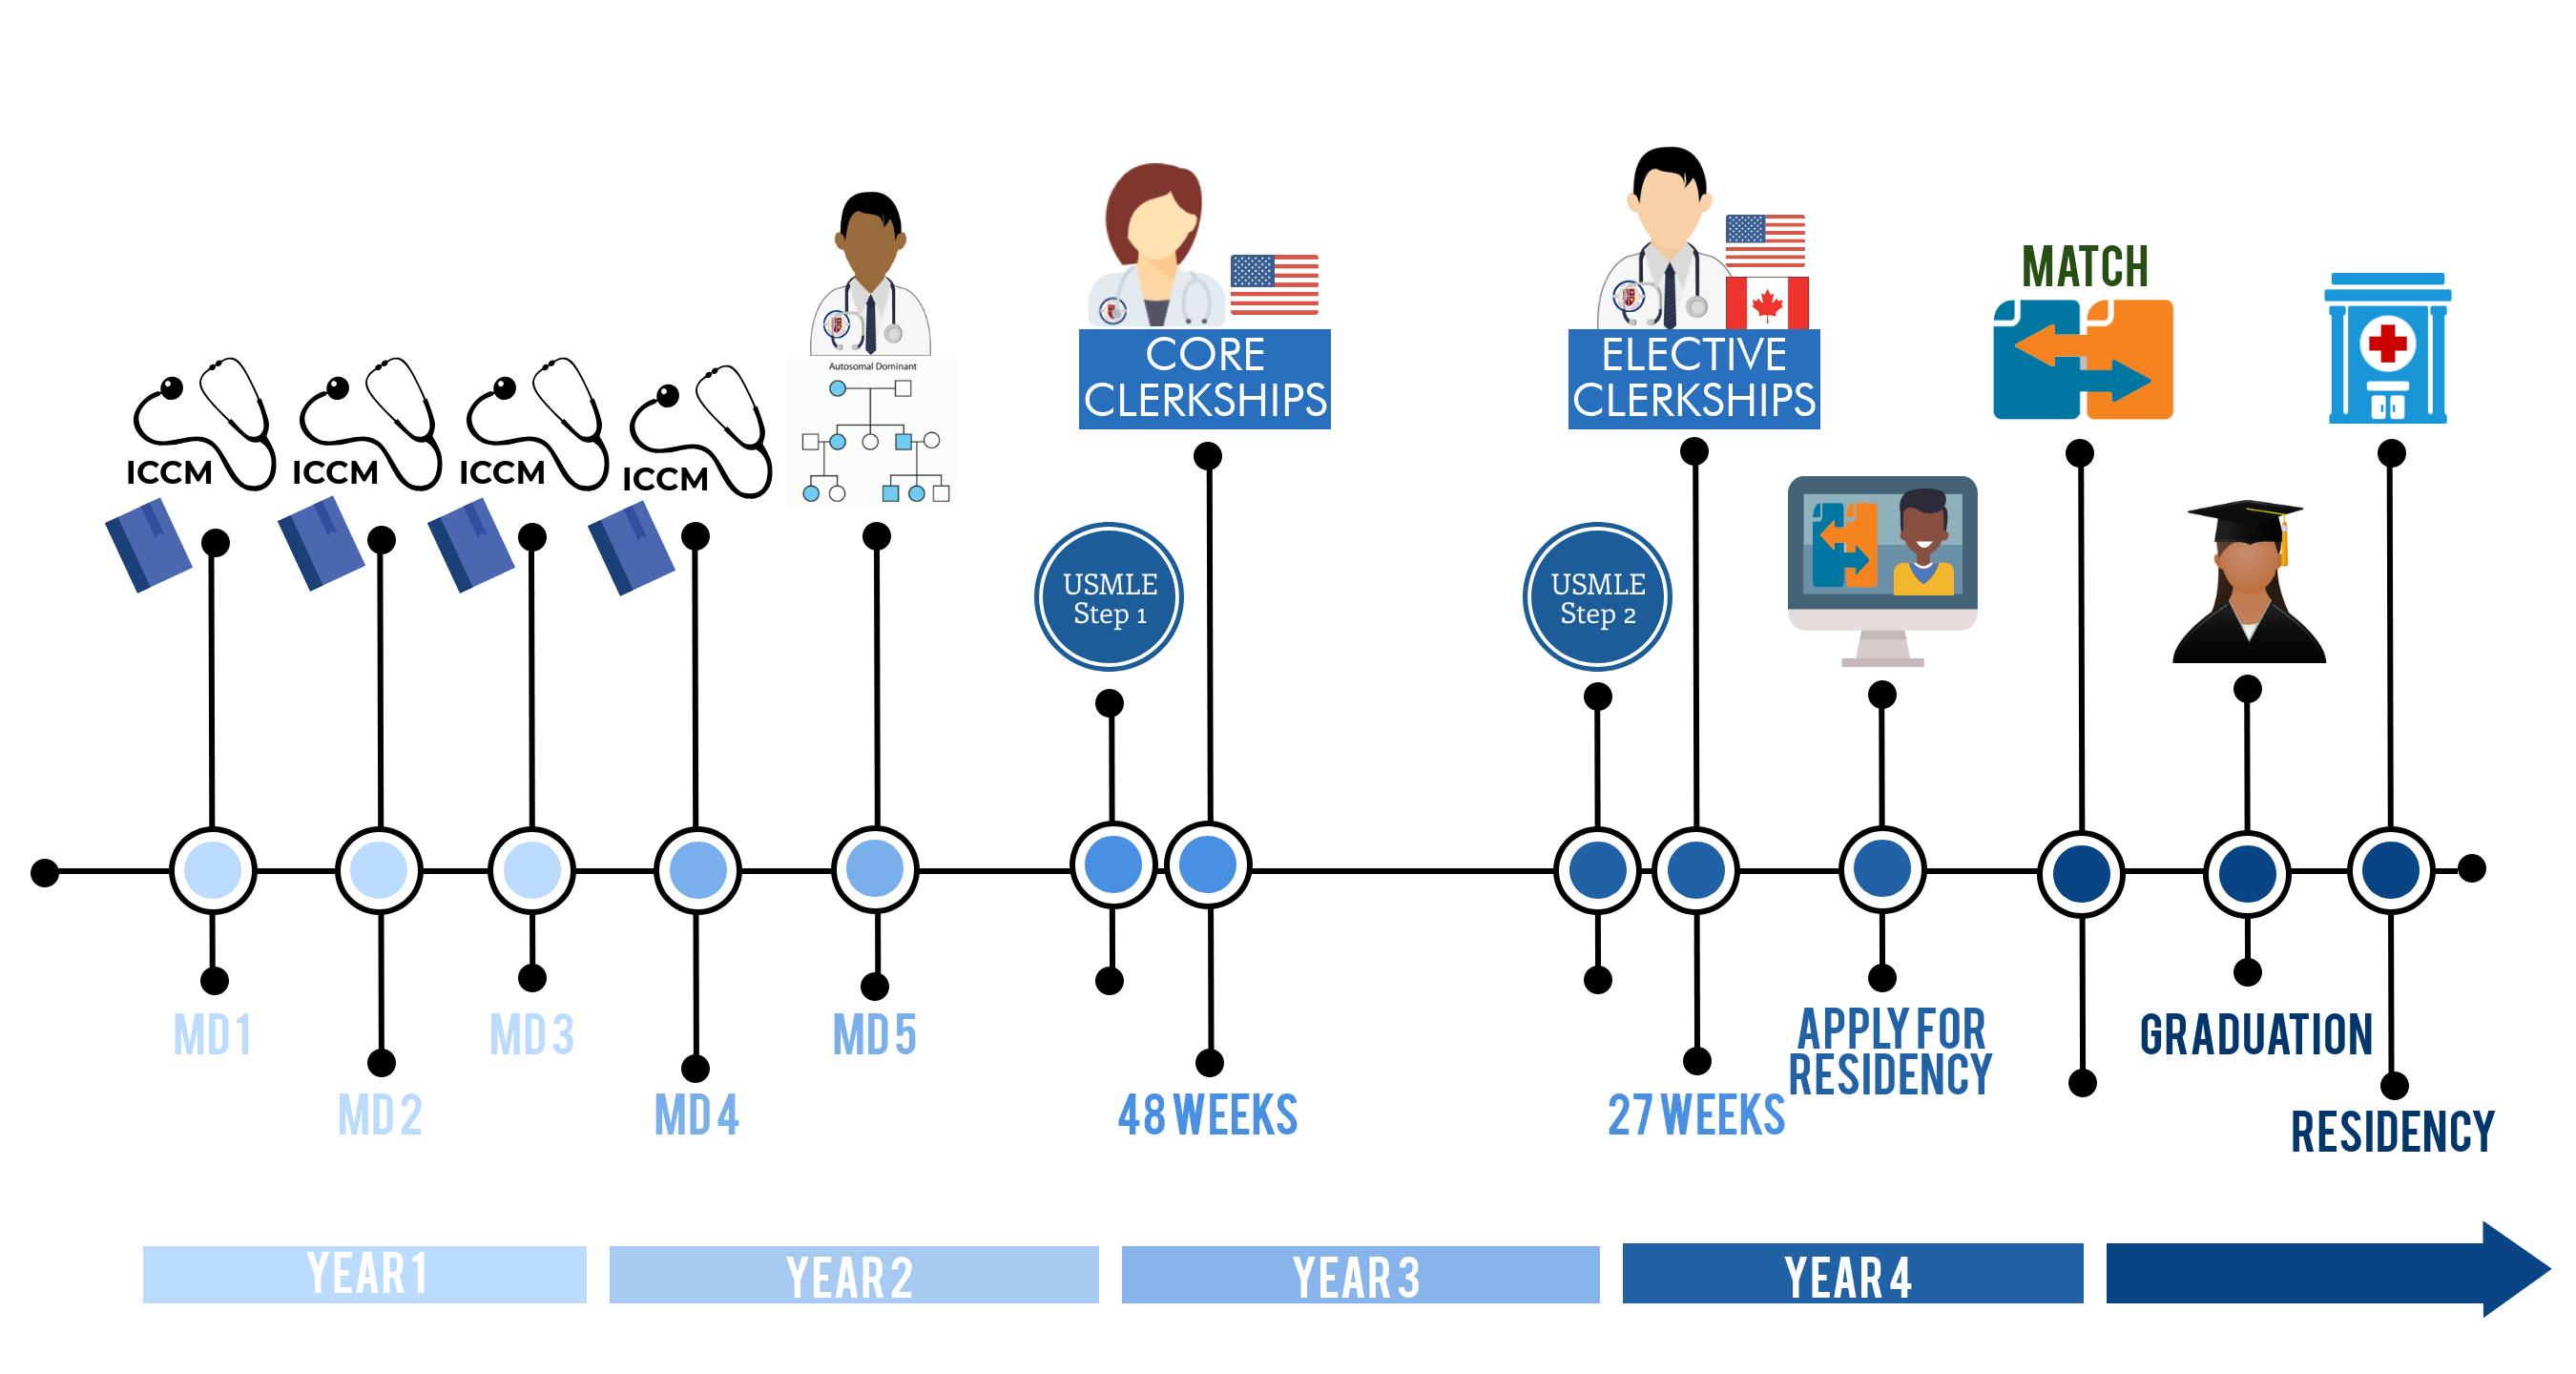 4 year MD Timeline